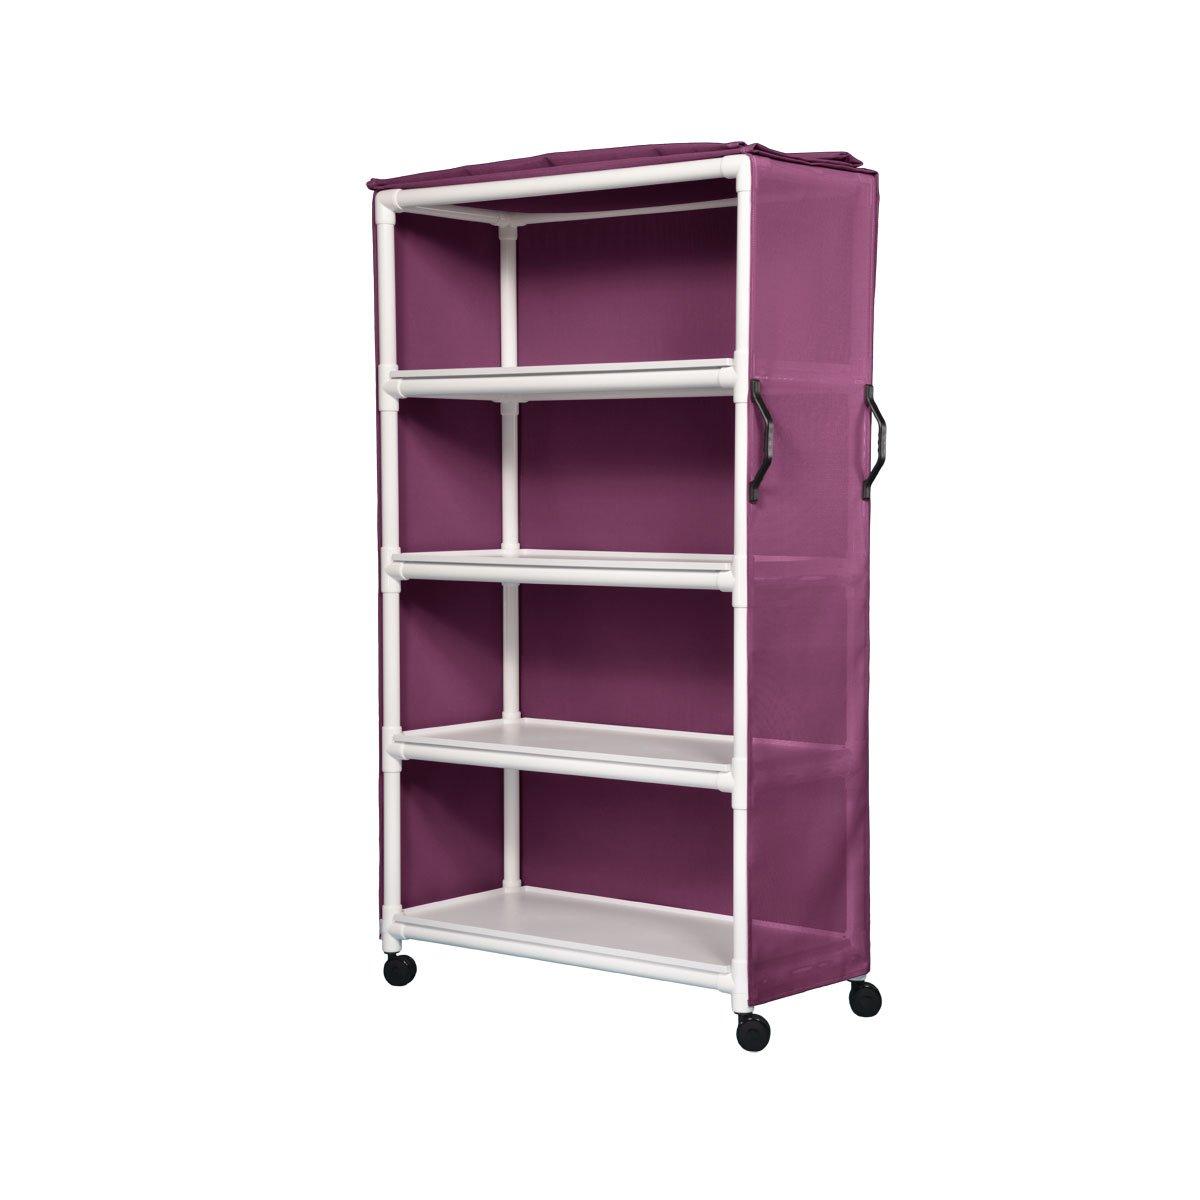 Std Line Linen Cart - Wineberry Mesh Four Dedication Max 73% OFF 45X20 Shelves